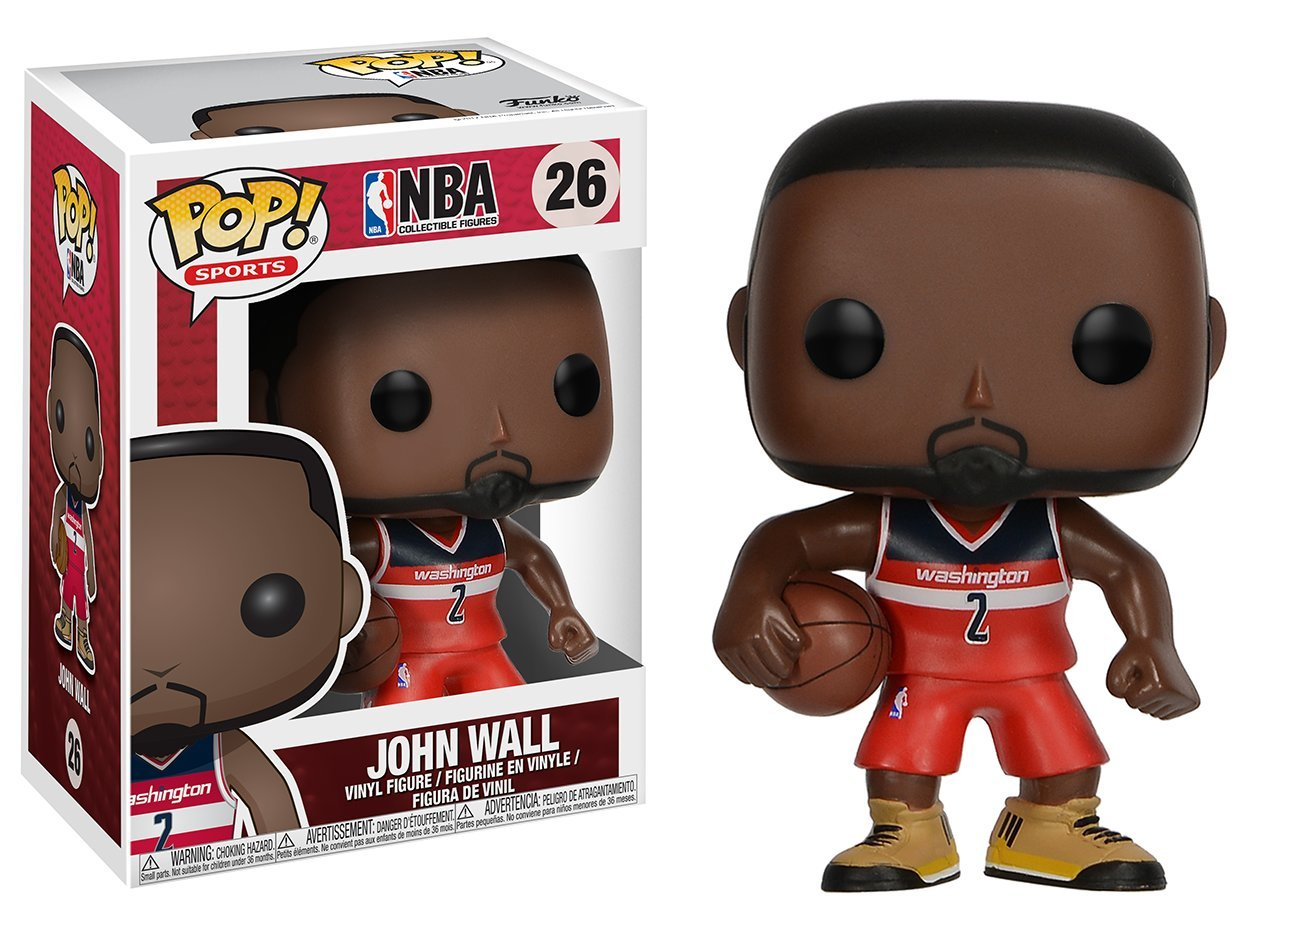 Funko Pop John Wall Washington Wizards (NBA 26) Funko Pop NBA